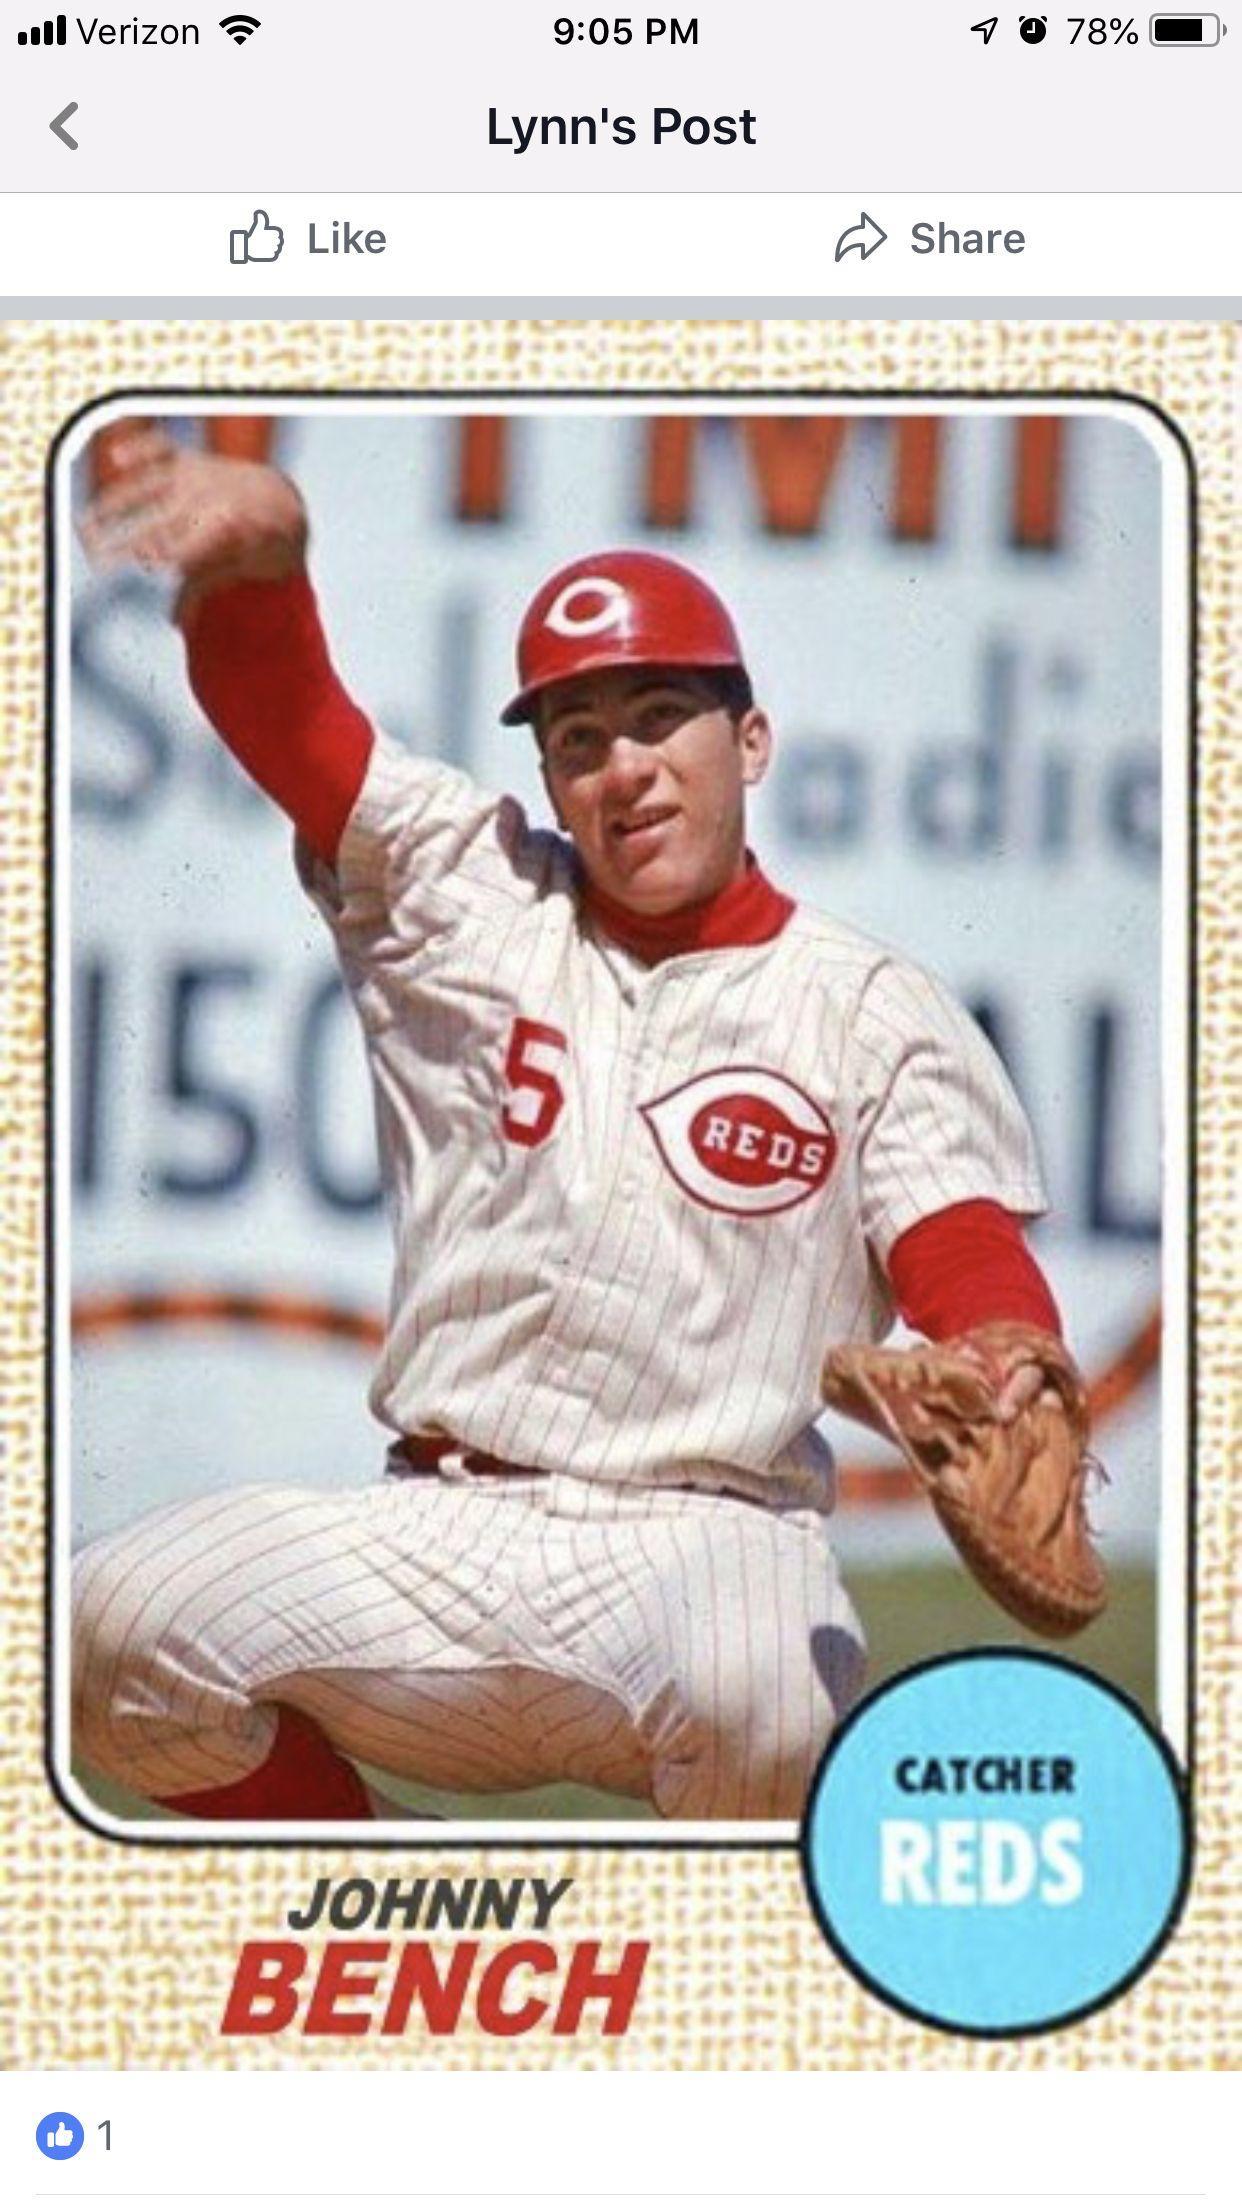 Pin By Steve Acord On Cincinnati Reds Baseball Cincinnati Reds Baseball Reds Baseball Cincinnati Reds